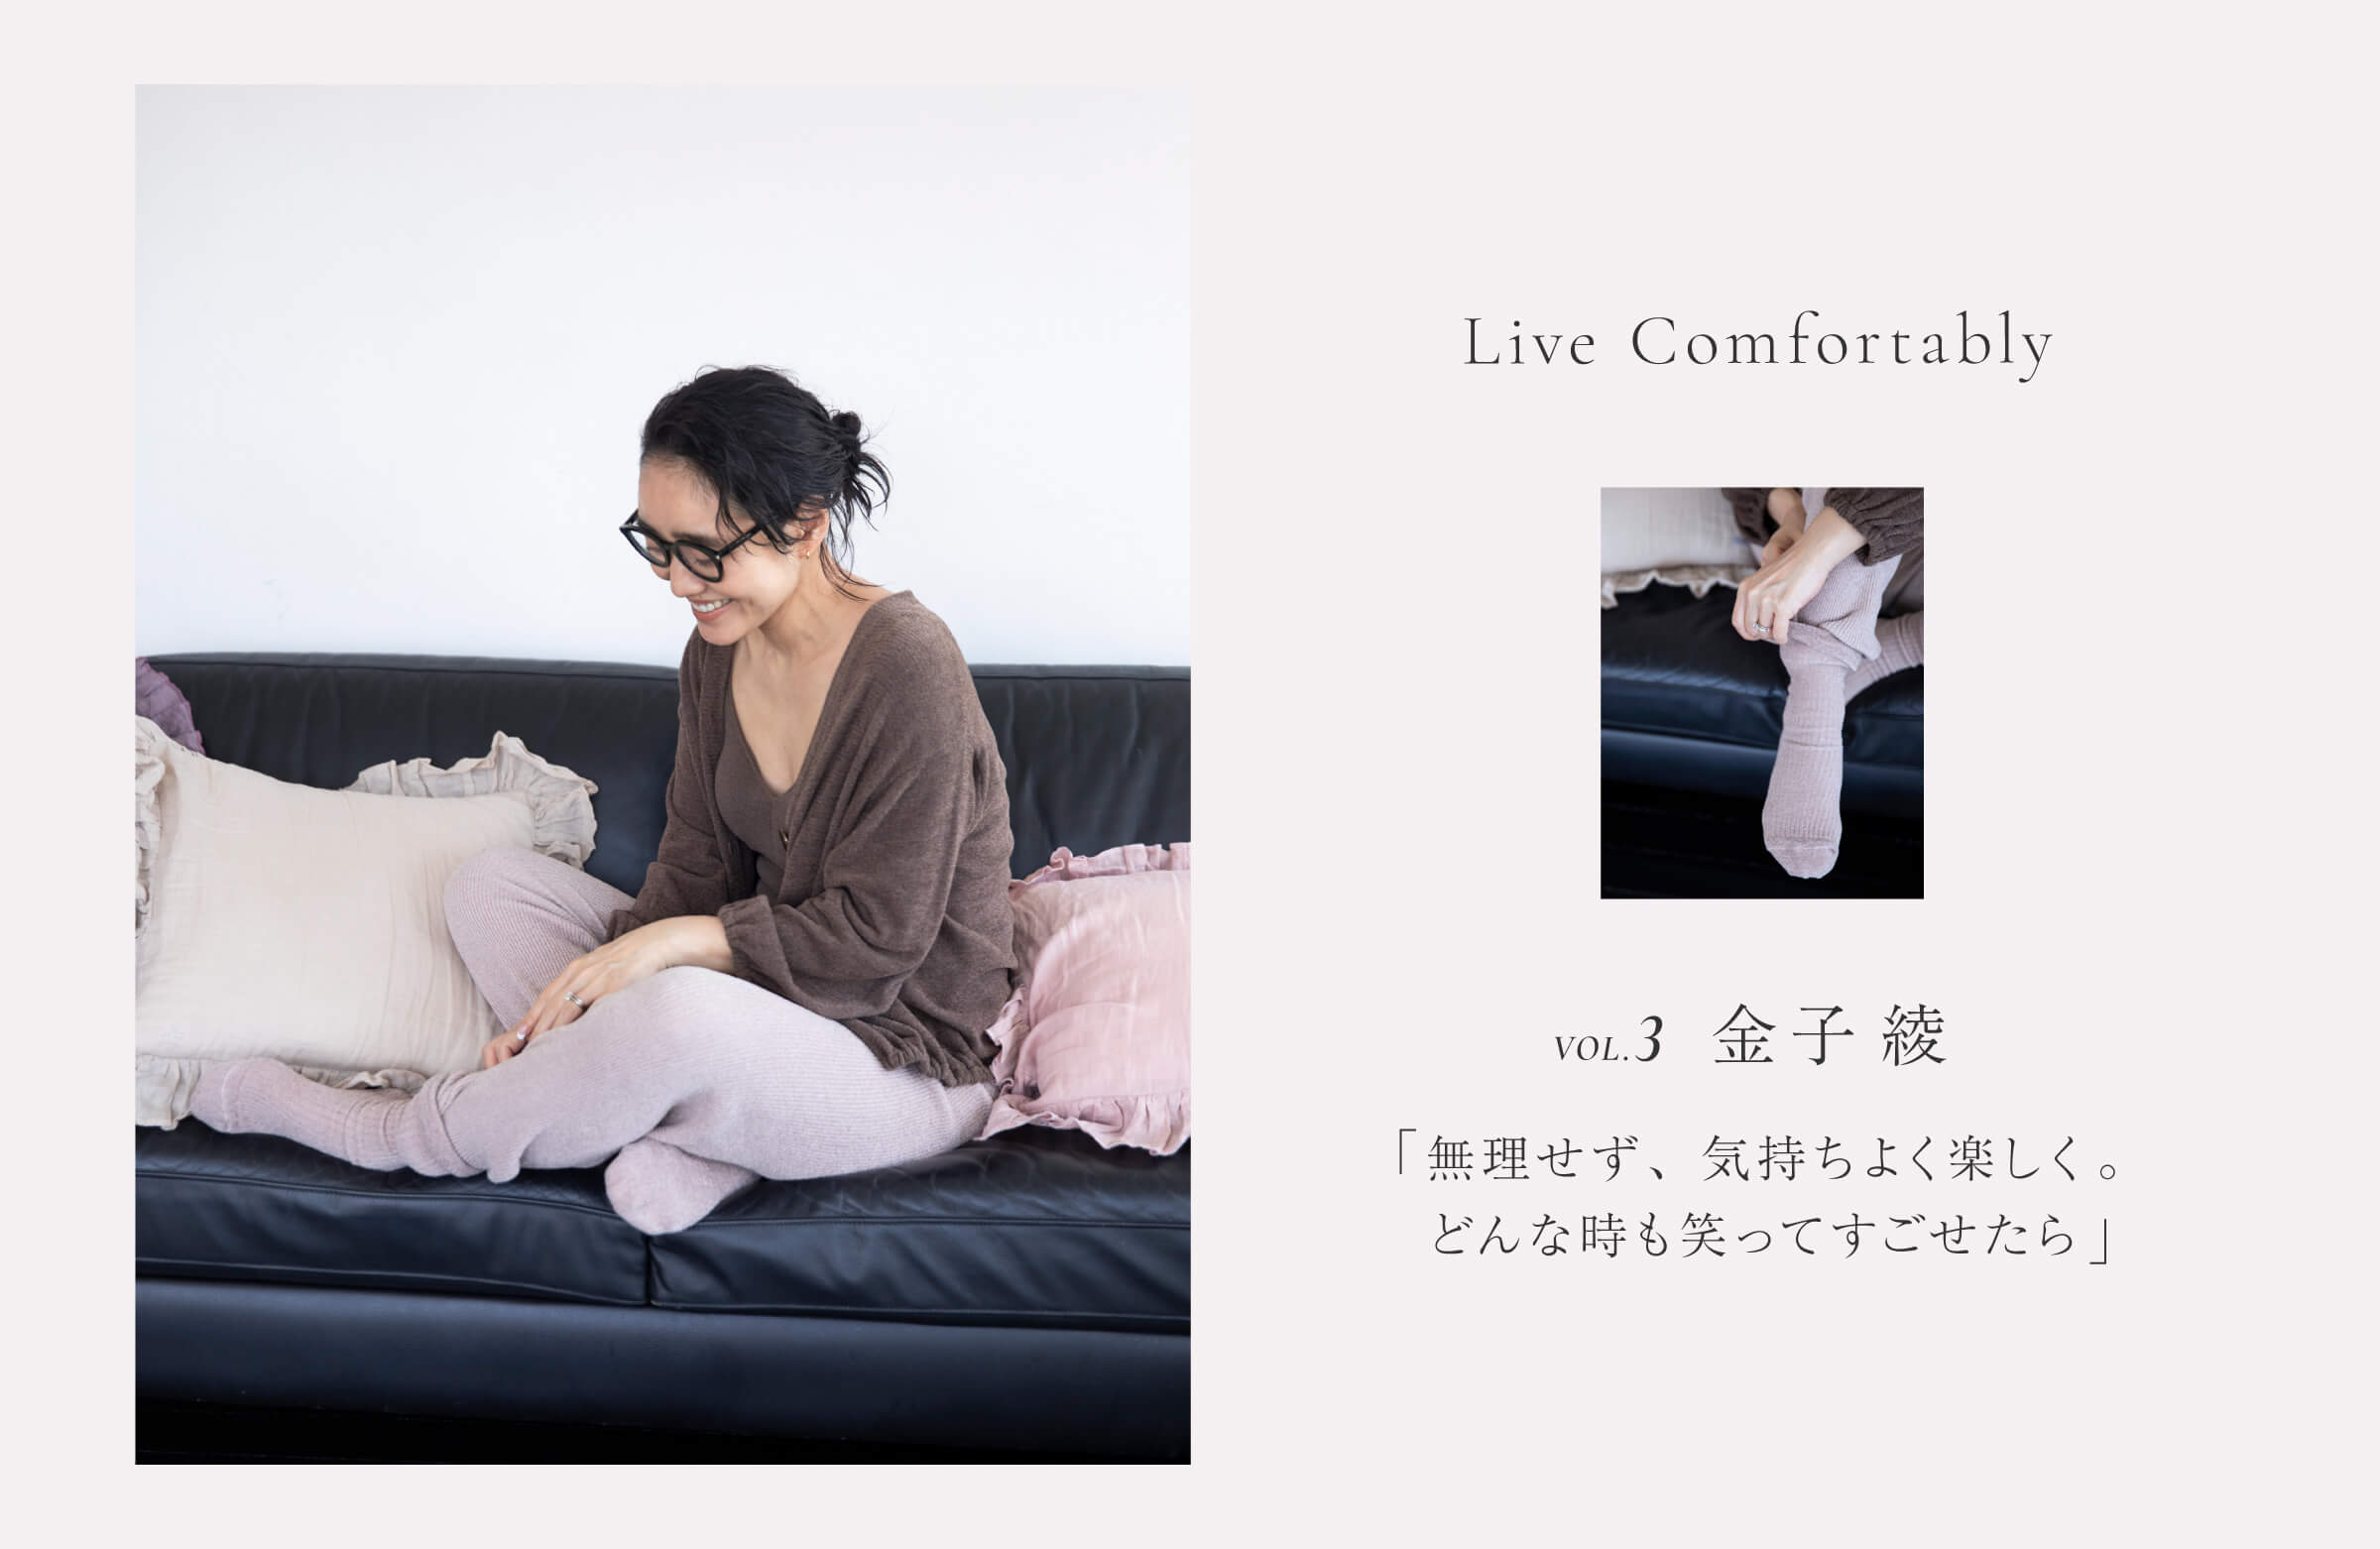 LIVE COMFORTABLY VOL.3 金子 綾 「無理せず、気持ちよく楽しく。どんな時も笑ってすごせたら」